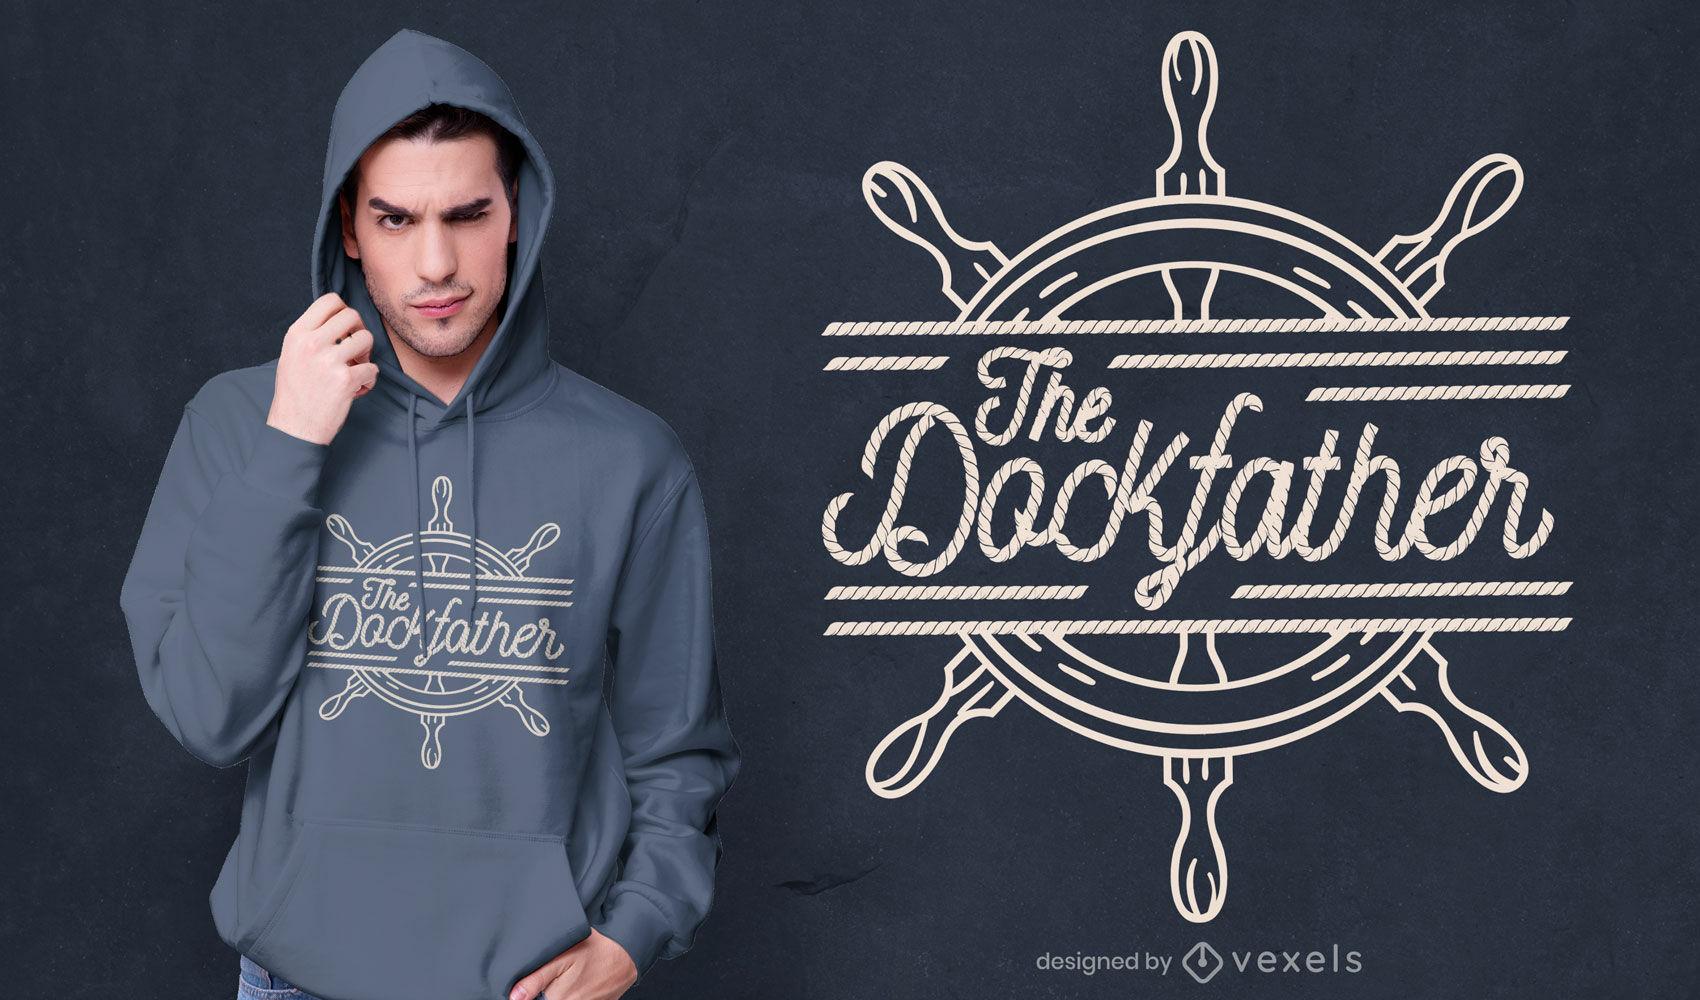 The dockfather t-shirt design